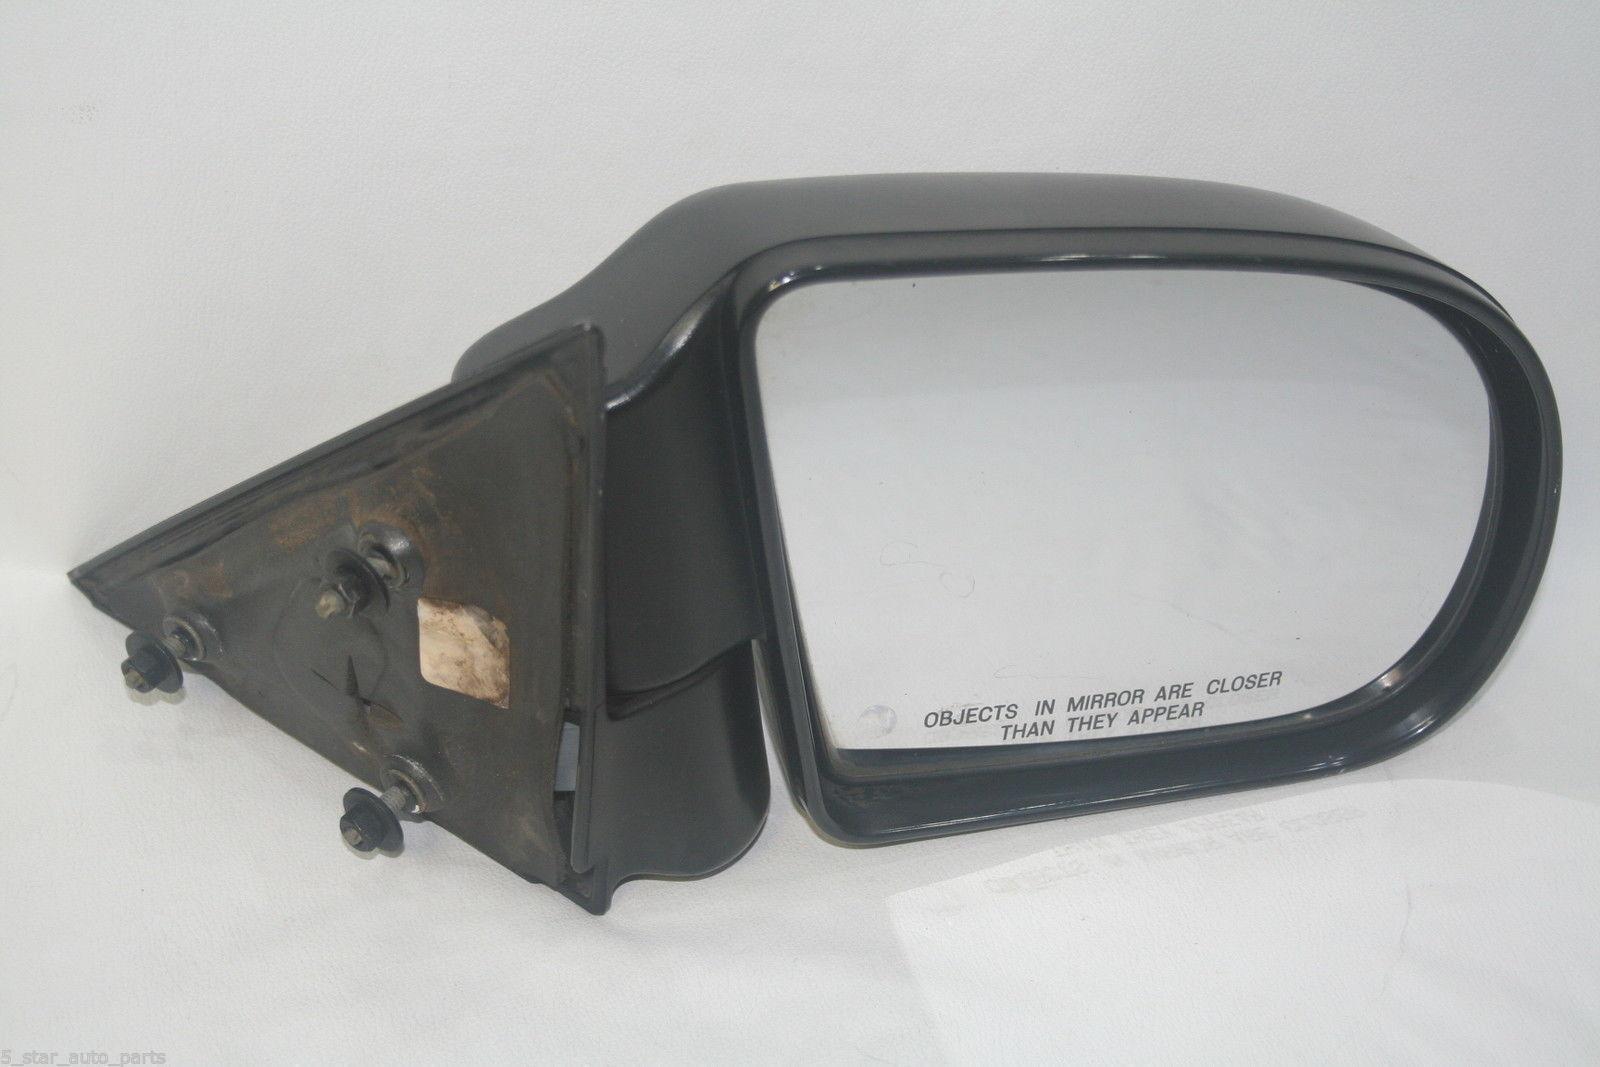 Chevy Blazer Mirror Exterior Penger Door And 10 Similar Items 57